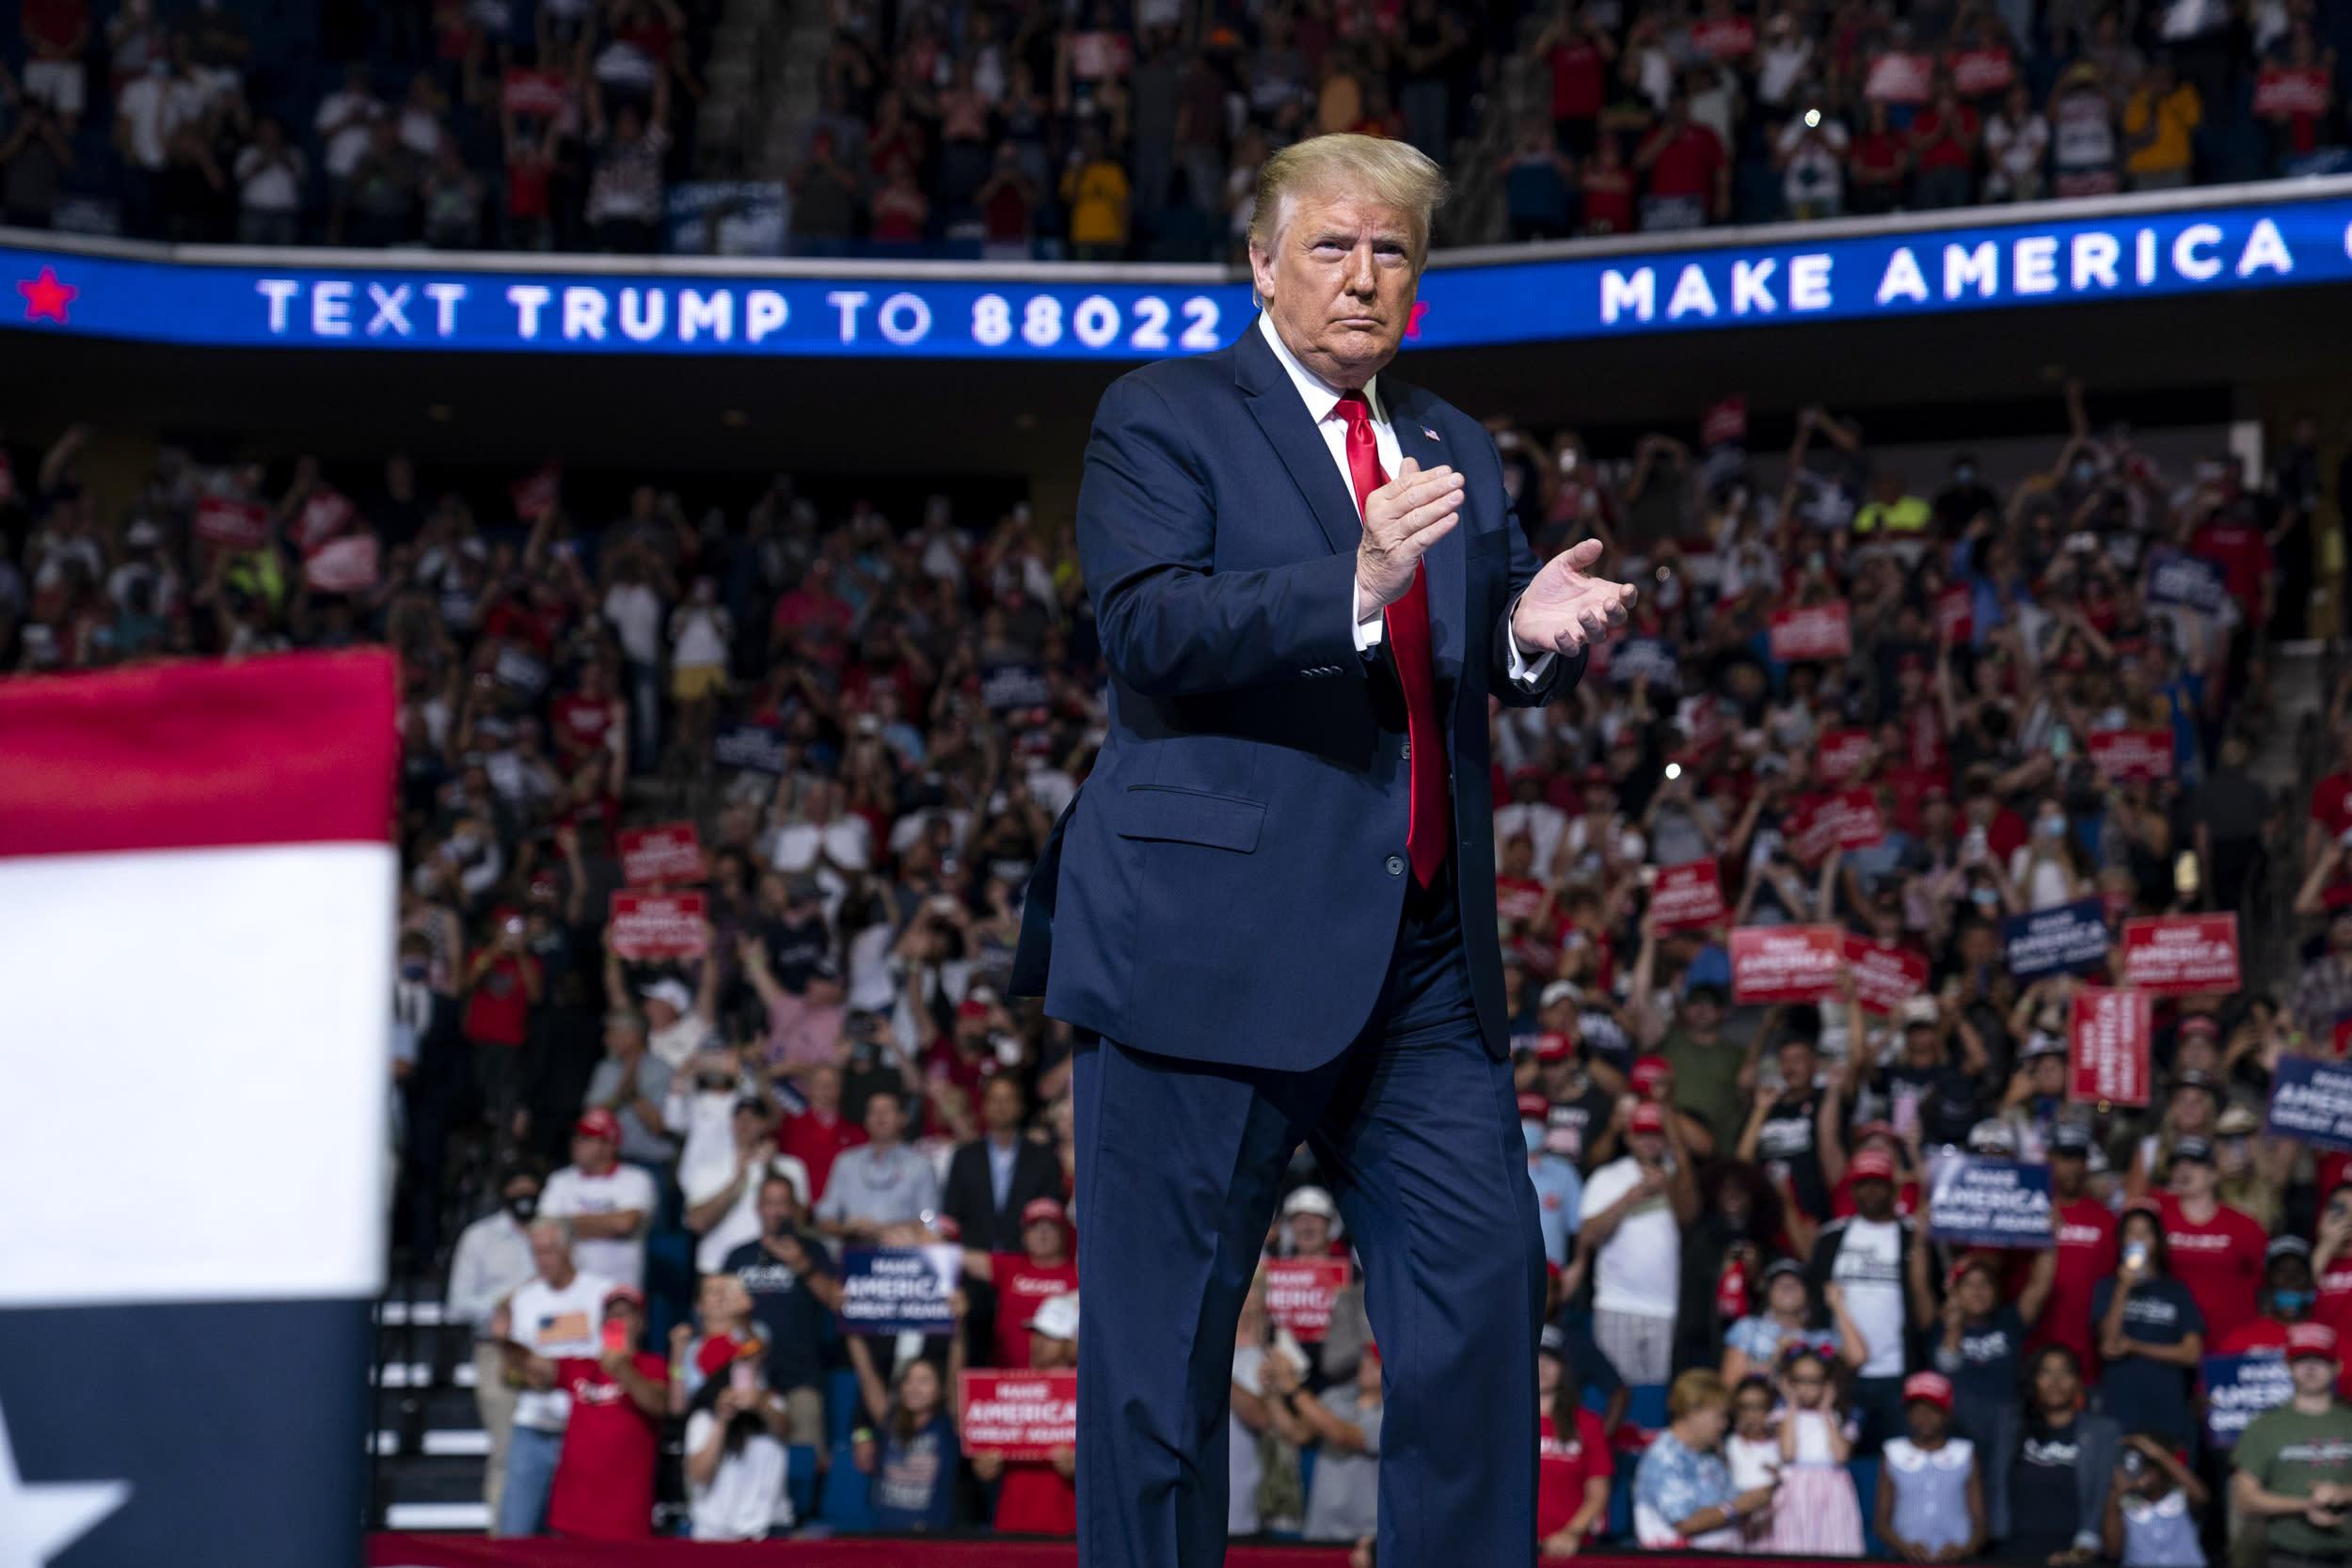 Trump won't follow N.J. quarantine order, White House says